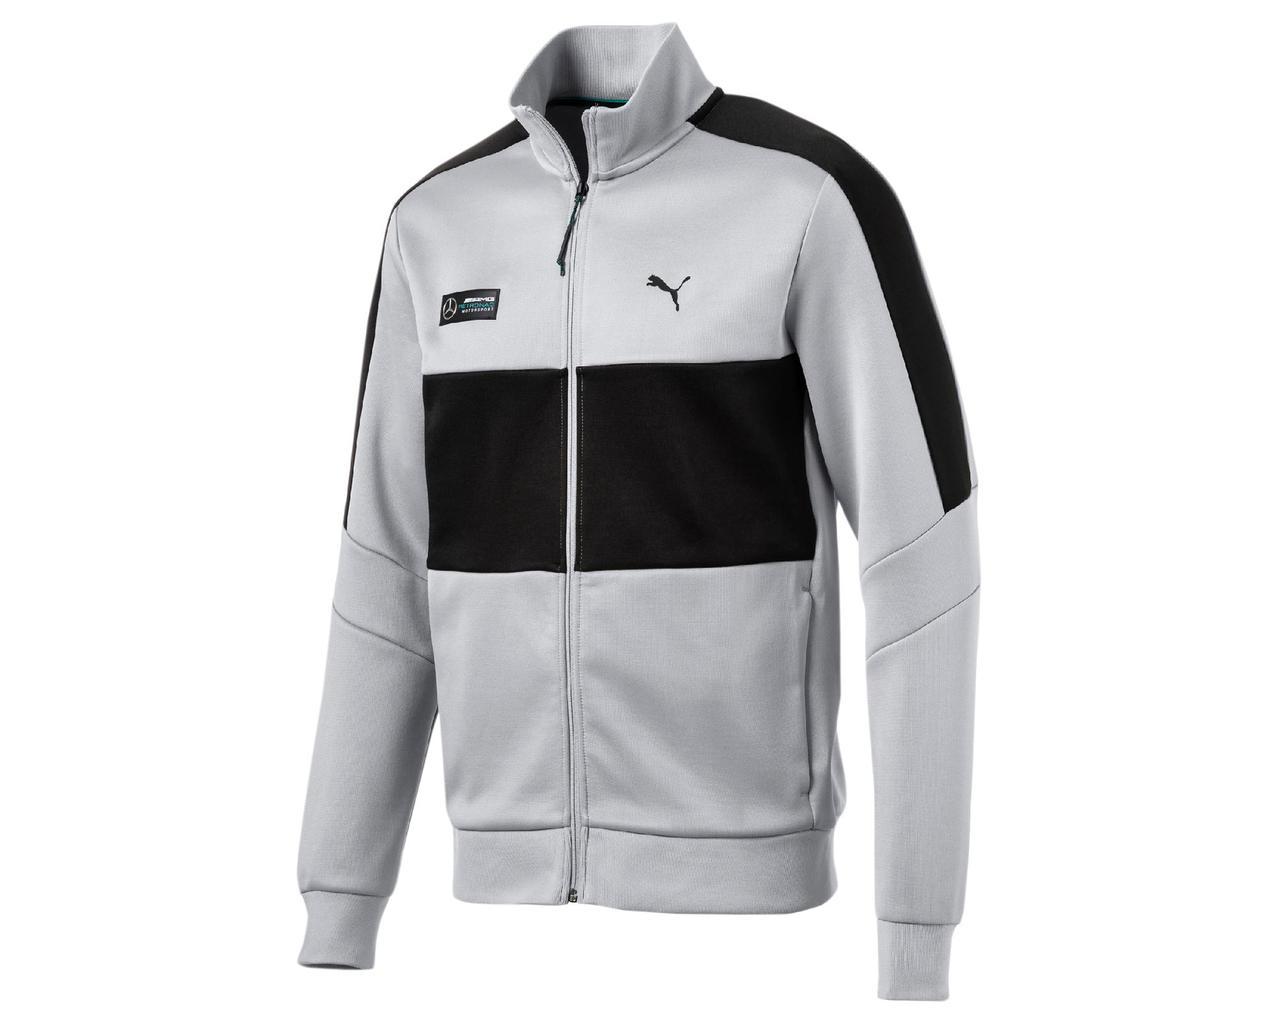 Мужская спортивная толстовка Mapm T7 Track Jacket